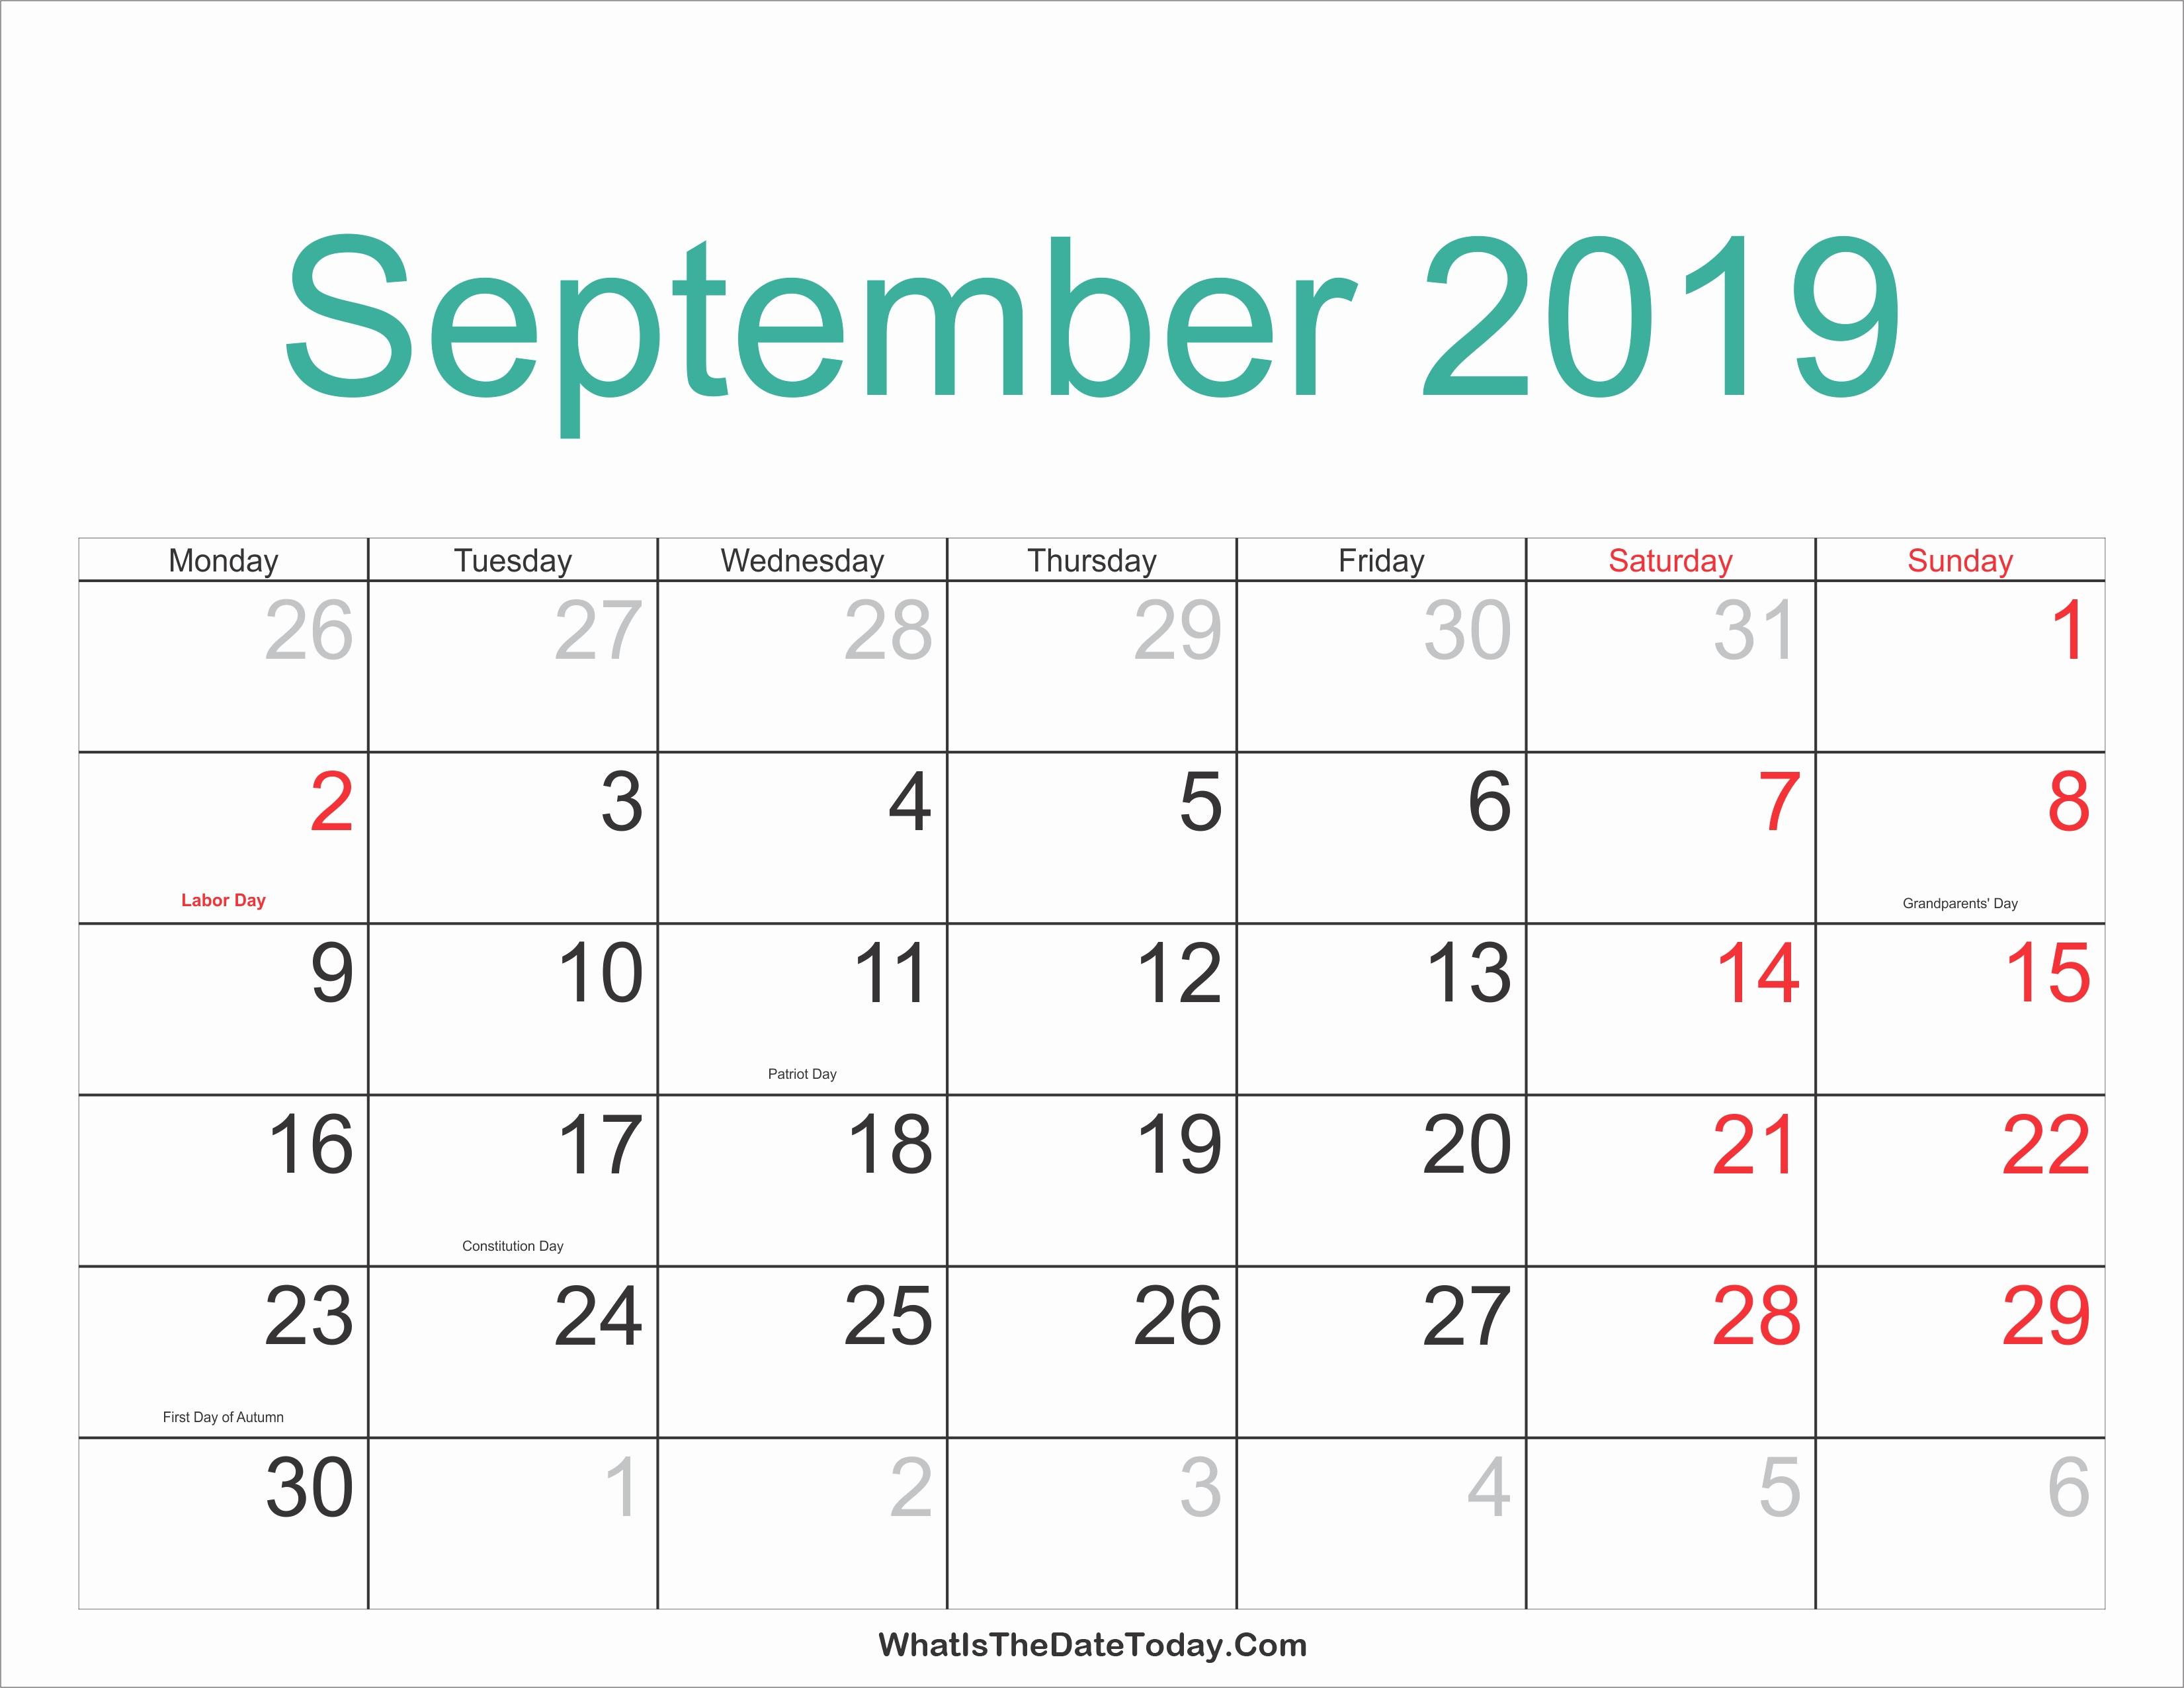 Unique 32 Design Jewish Holidays In Sept | Shyampooja-Calendar Of Jewish Holidays 2020